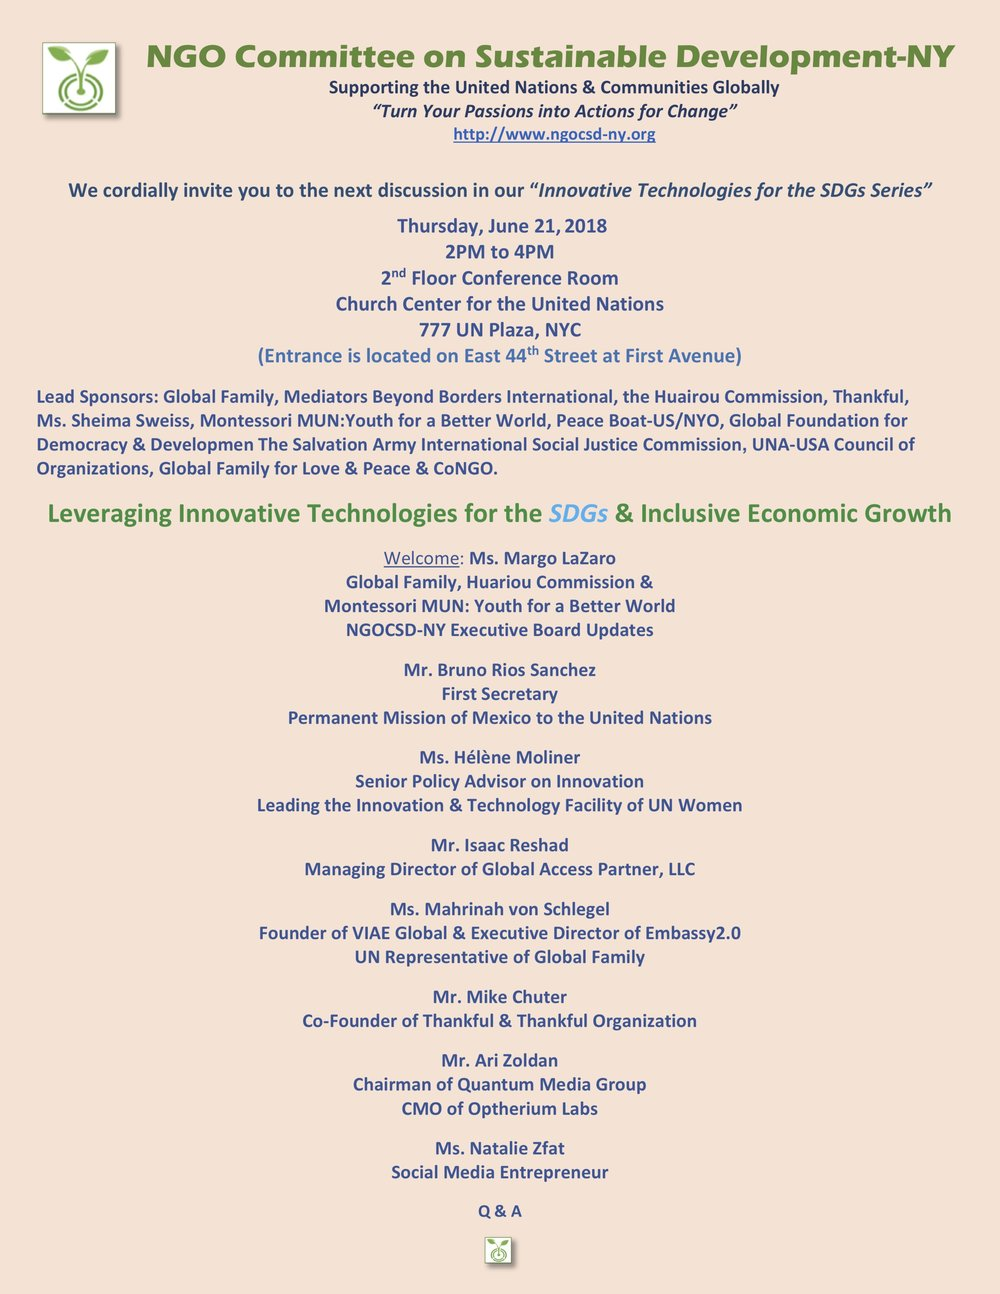 NGOCSD-NY+6-21-18+Lever.+Innov.+Tech.+Invit-B3bc.jpg